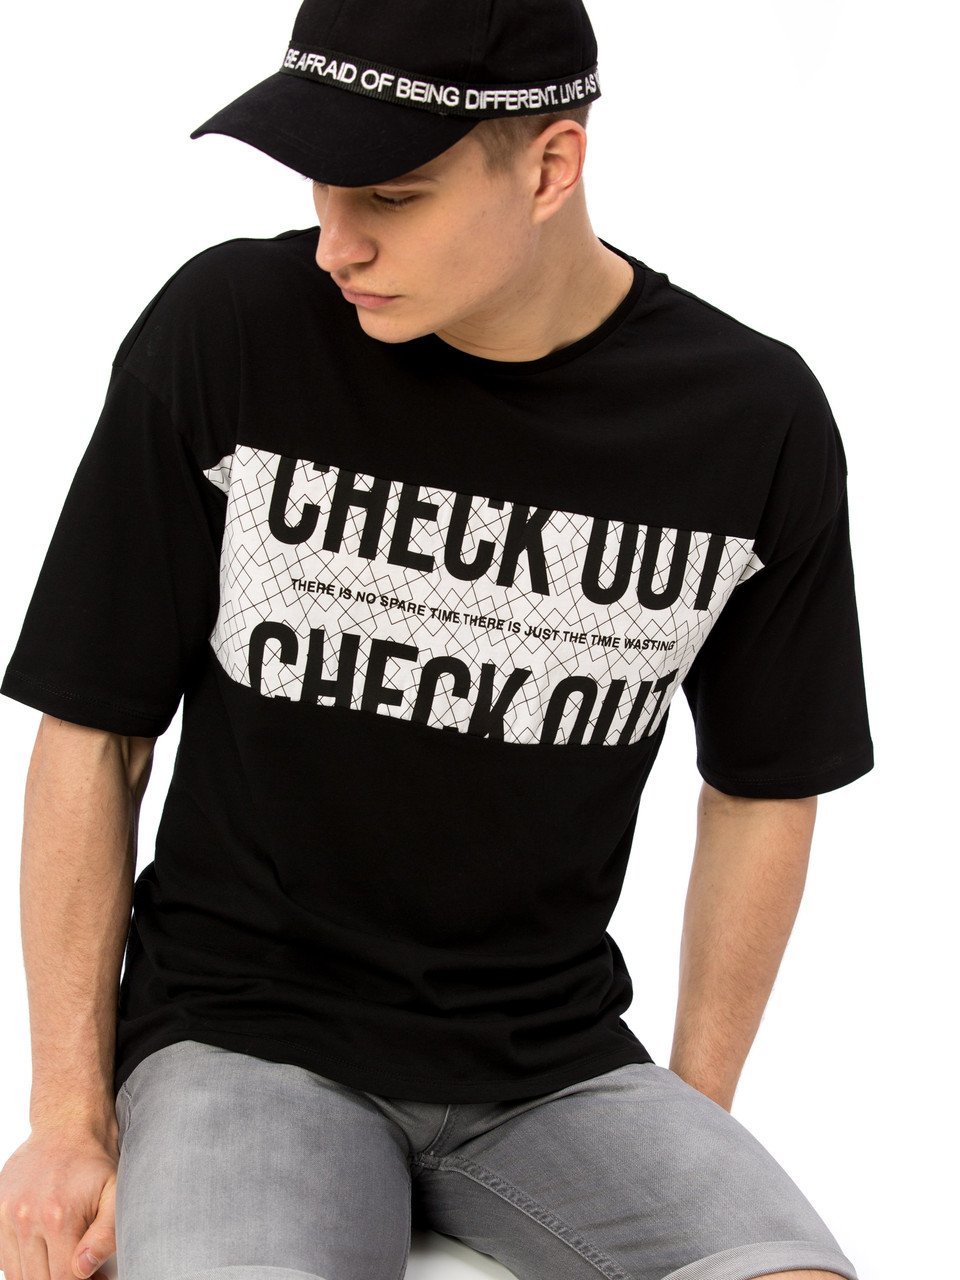 Черная мужская футболка LC Waikiki / ЛС Вайкики с надписью CHECK OUT